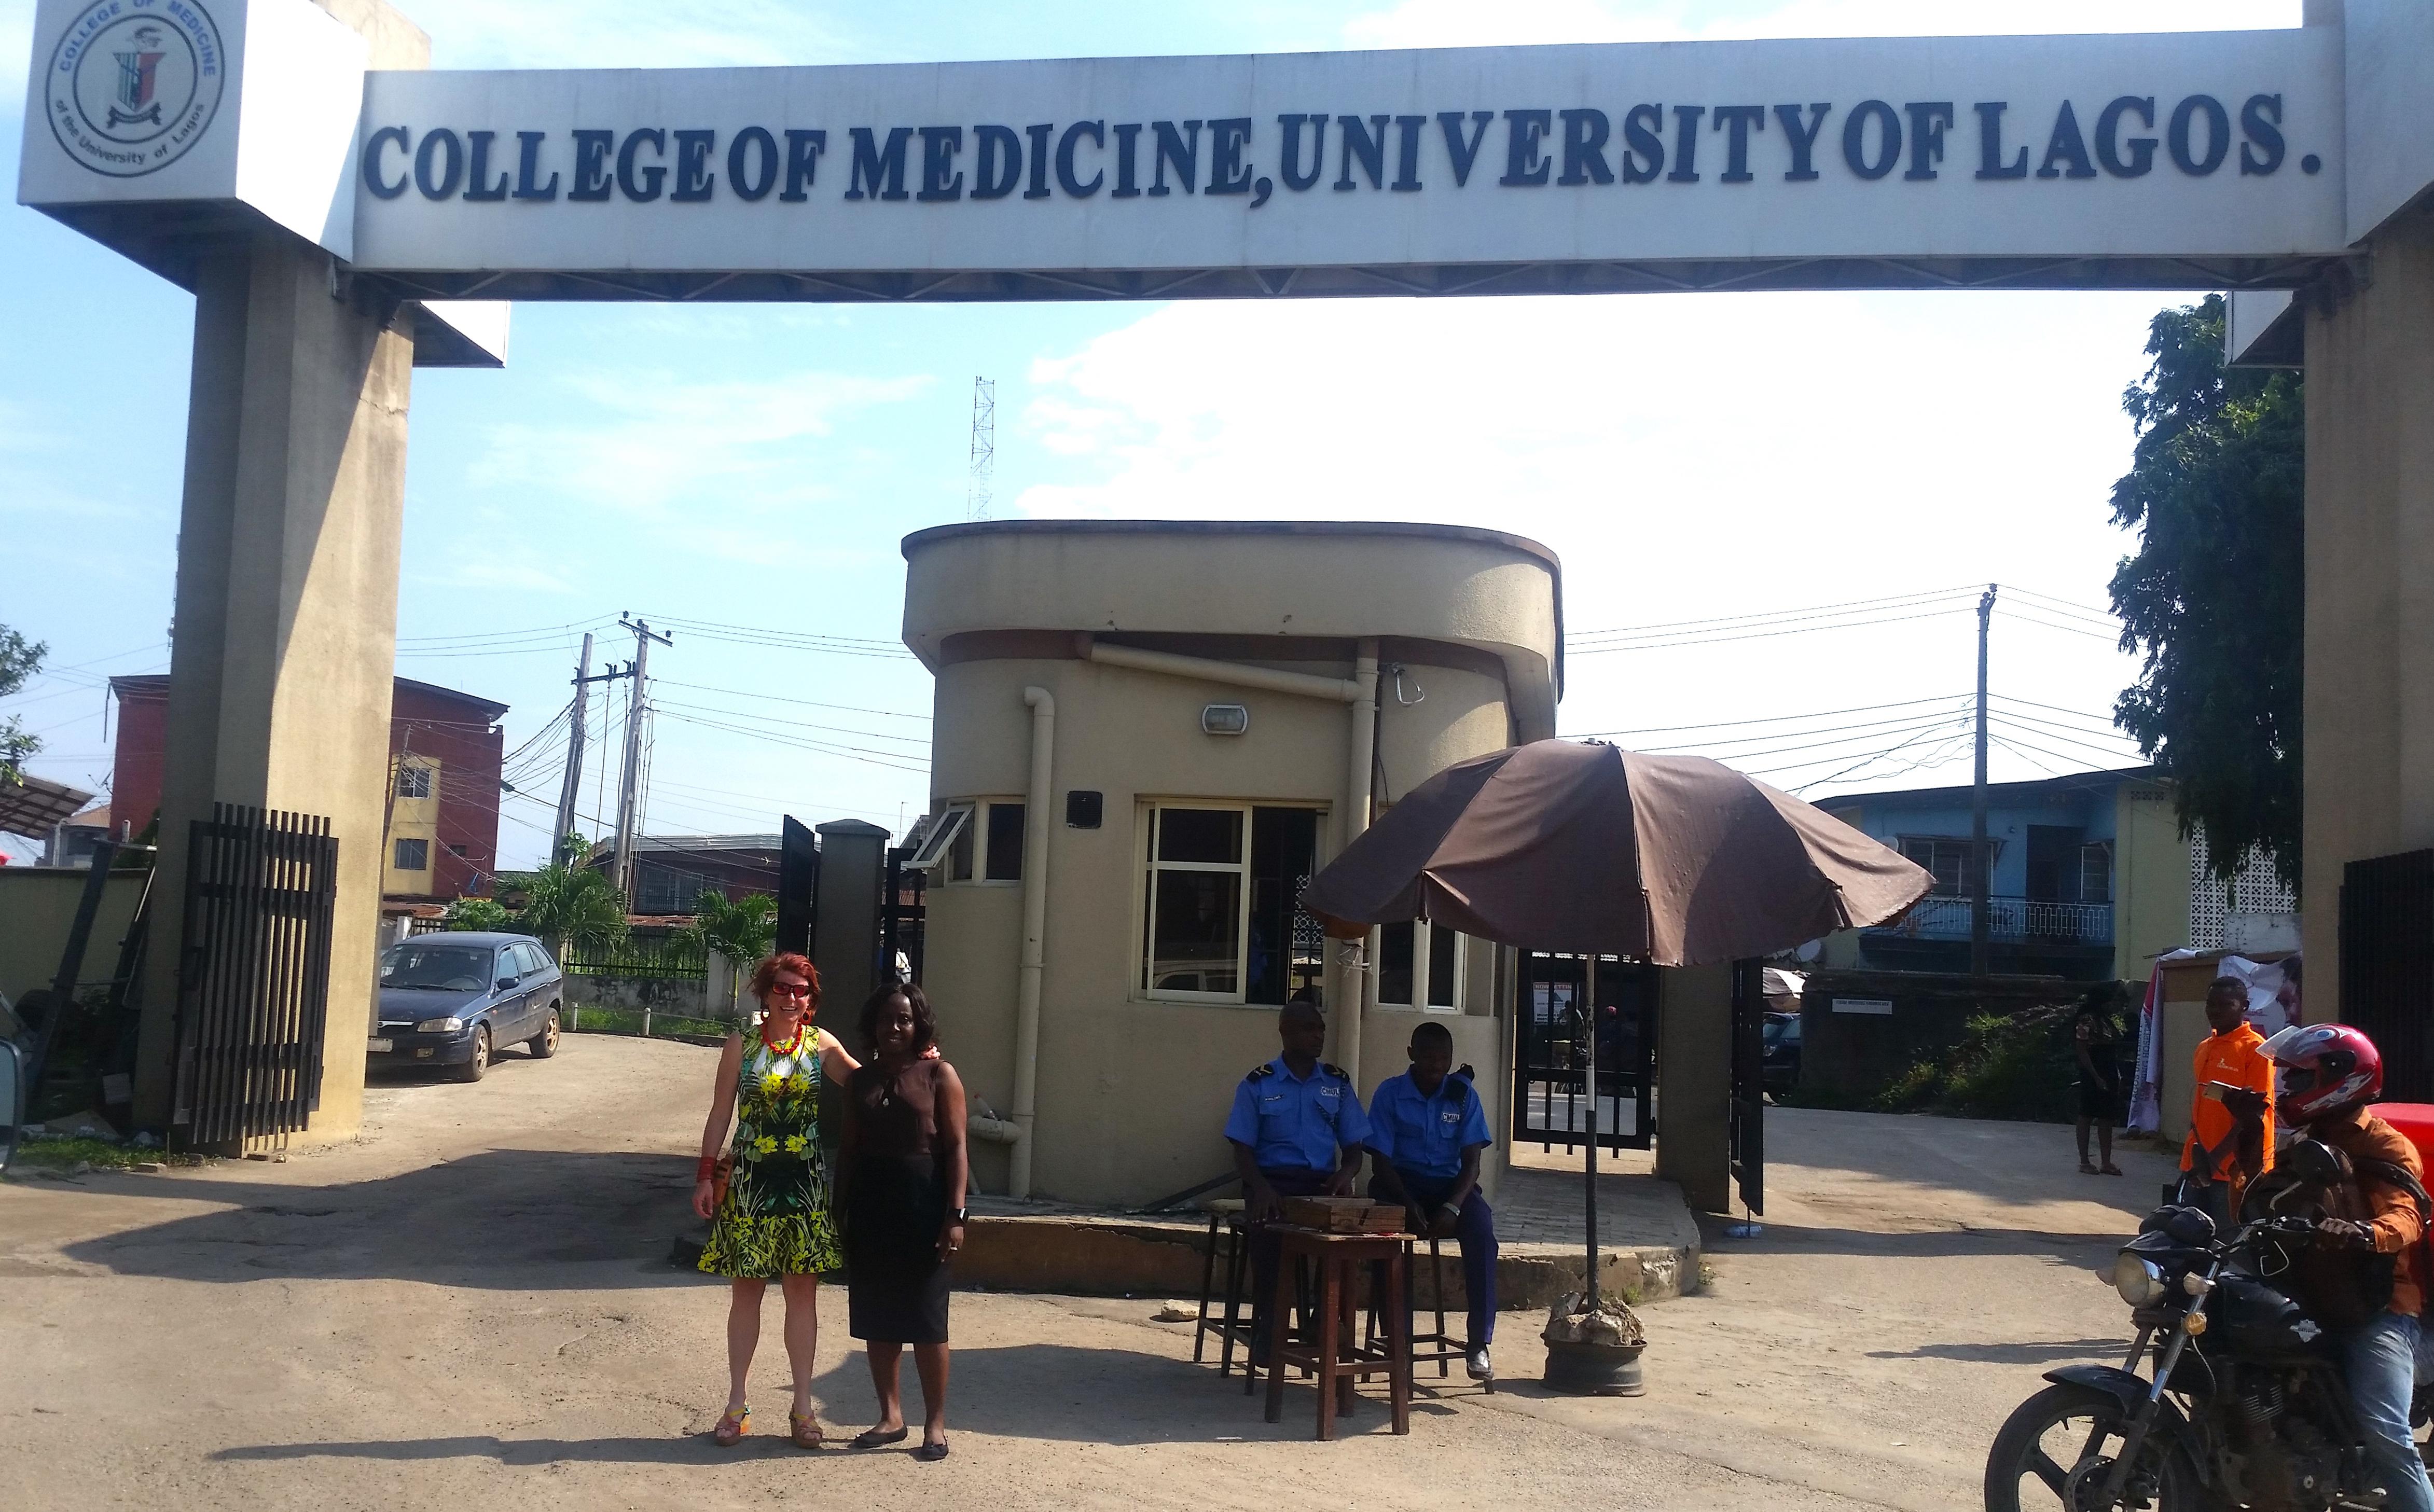 Patty Kostkova and colleague at Lagos University